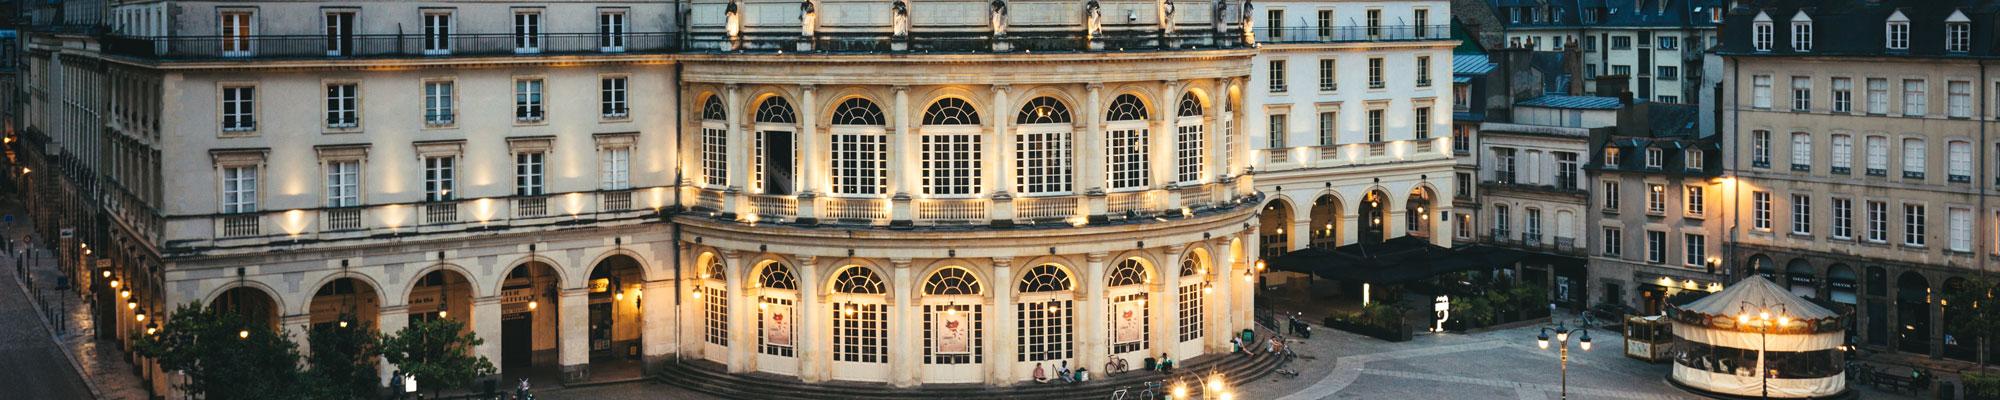 Bachelor à Rennes / Bac+3 en alternance